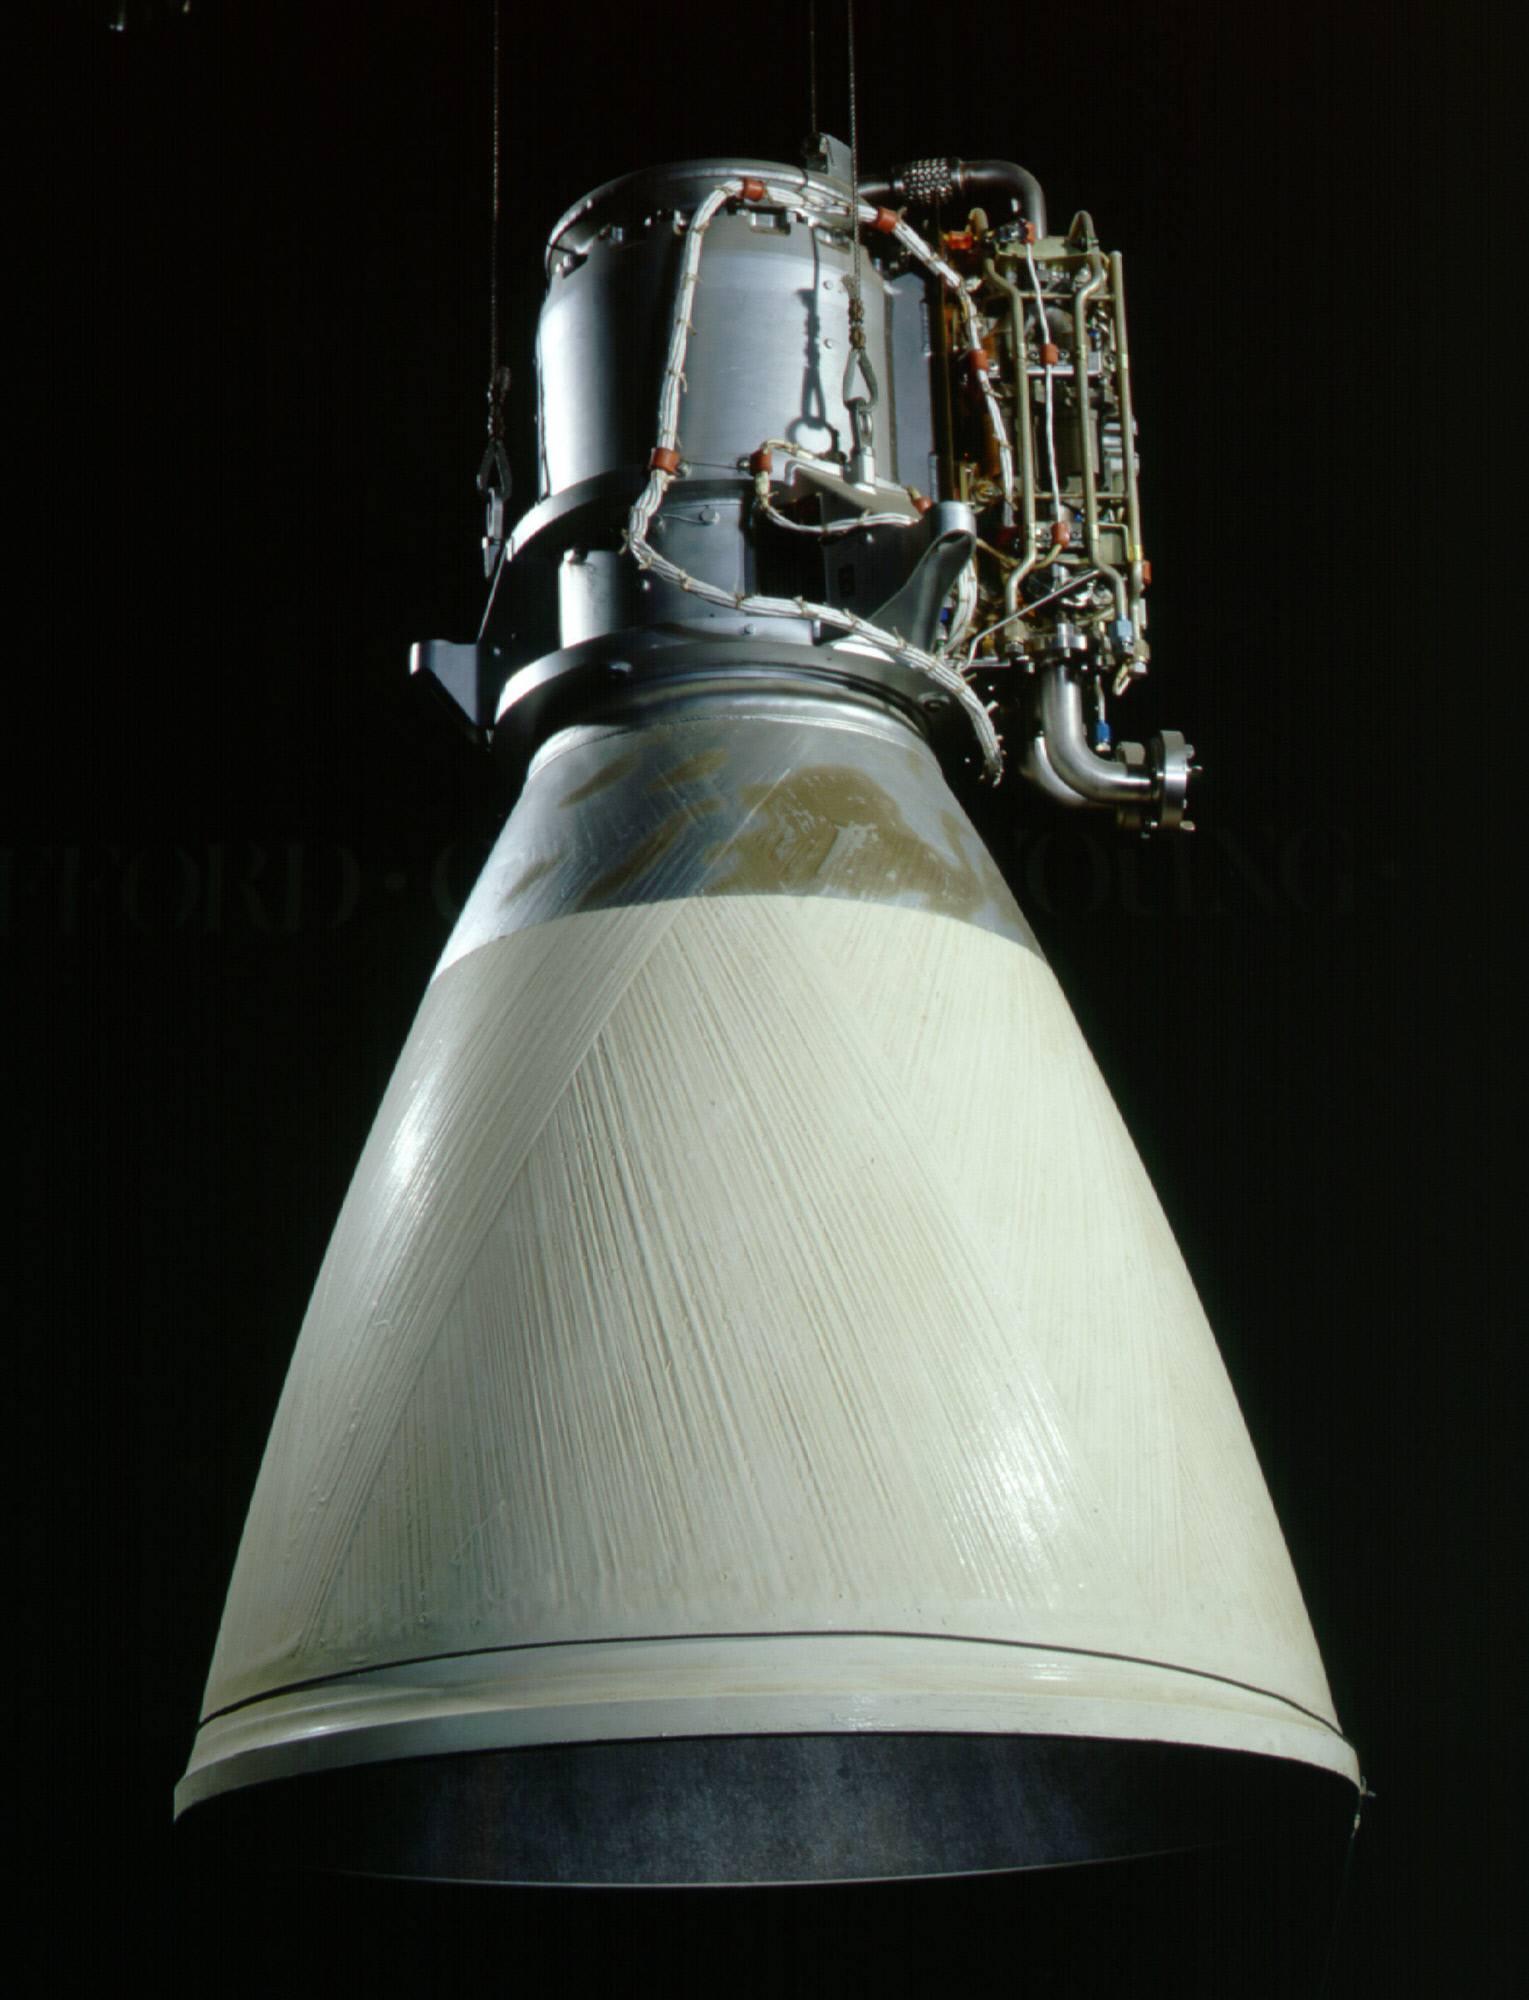 Apollo Lunar Module Ascent Engine